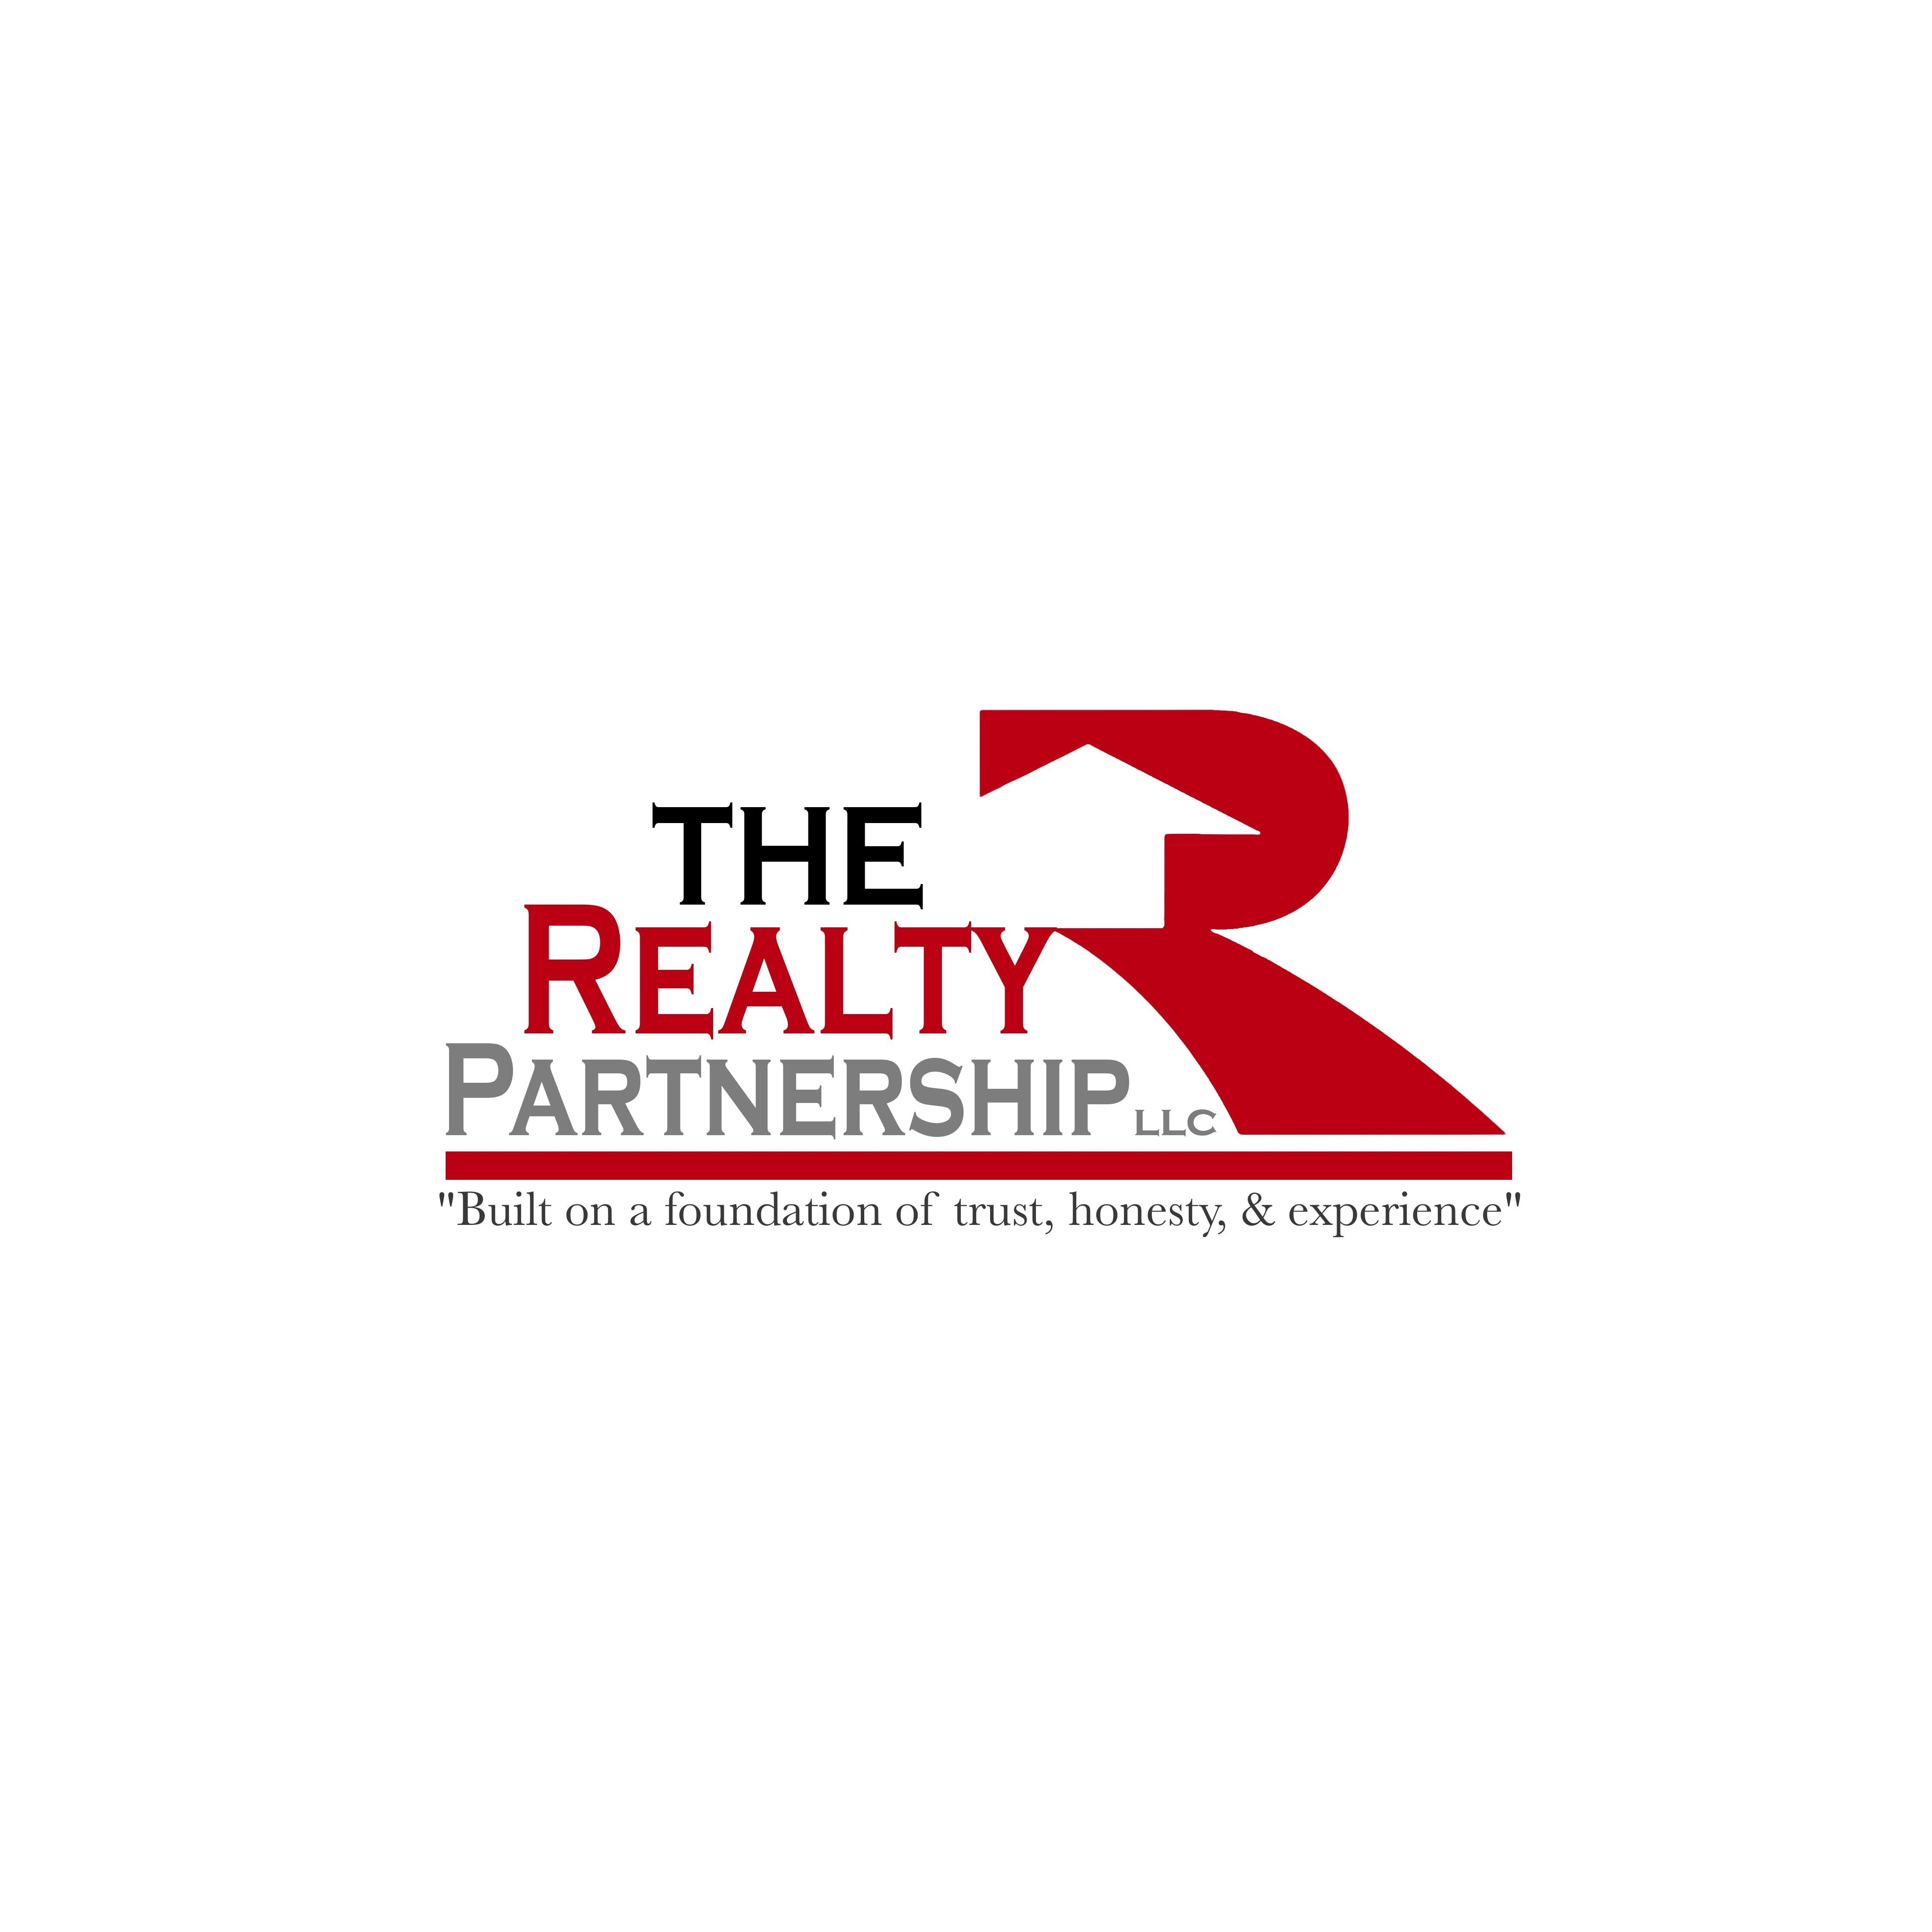 THE Realty Partnership, LLC